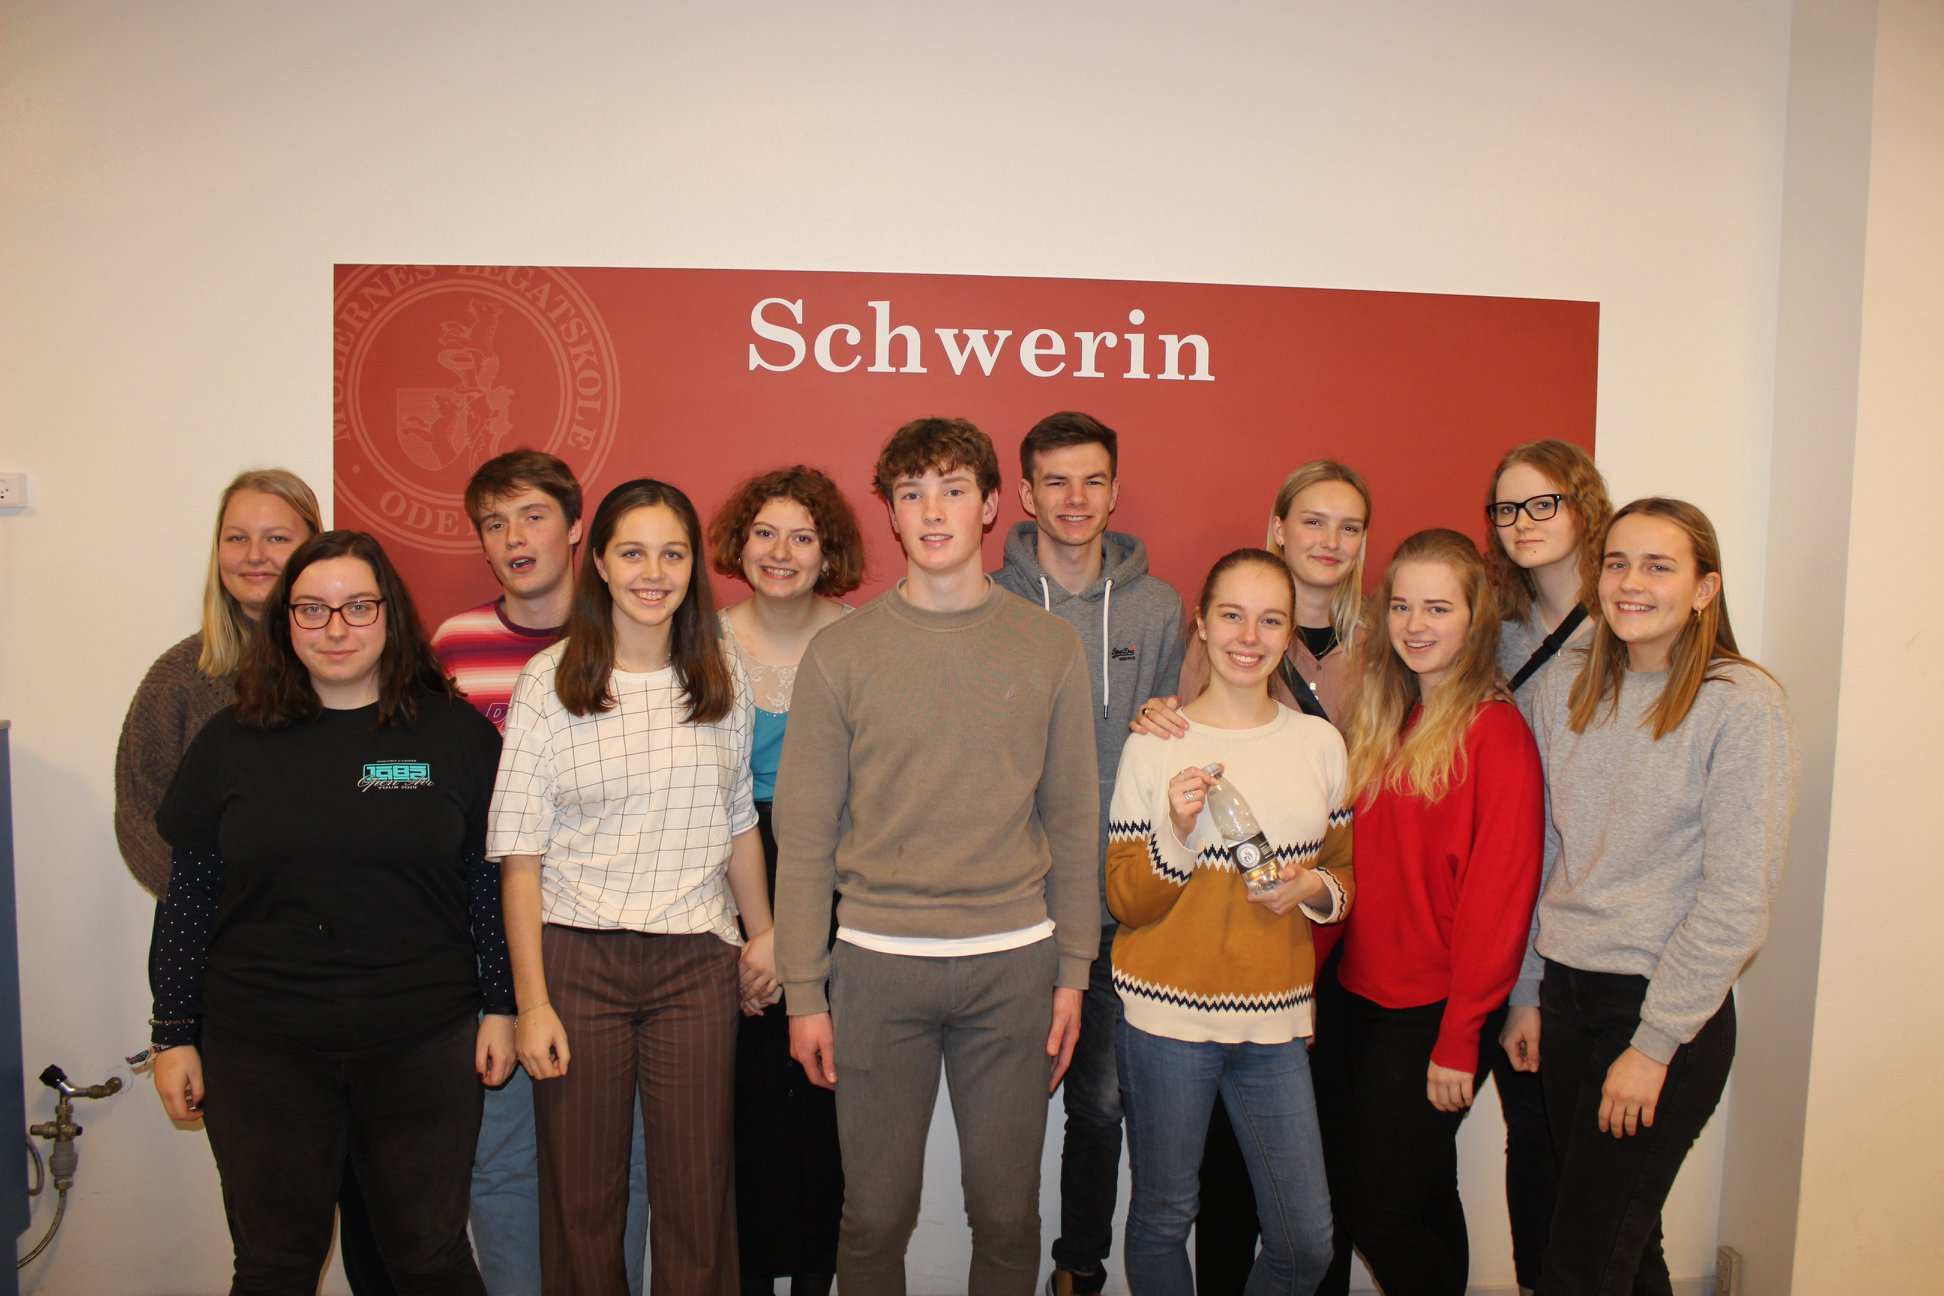 Schwerin 7